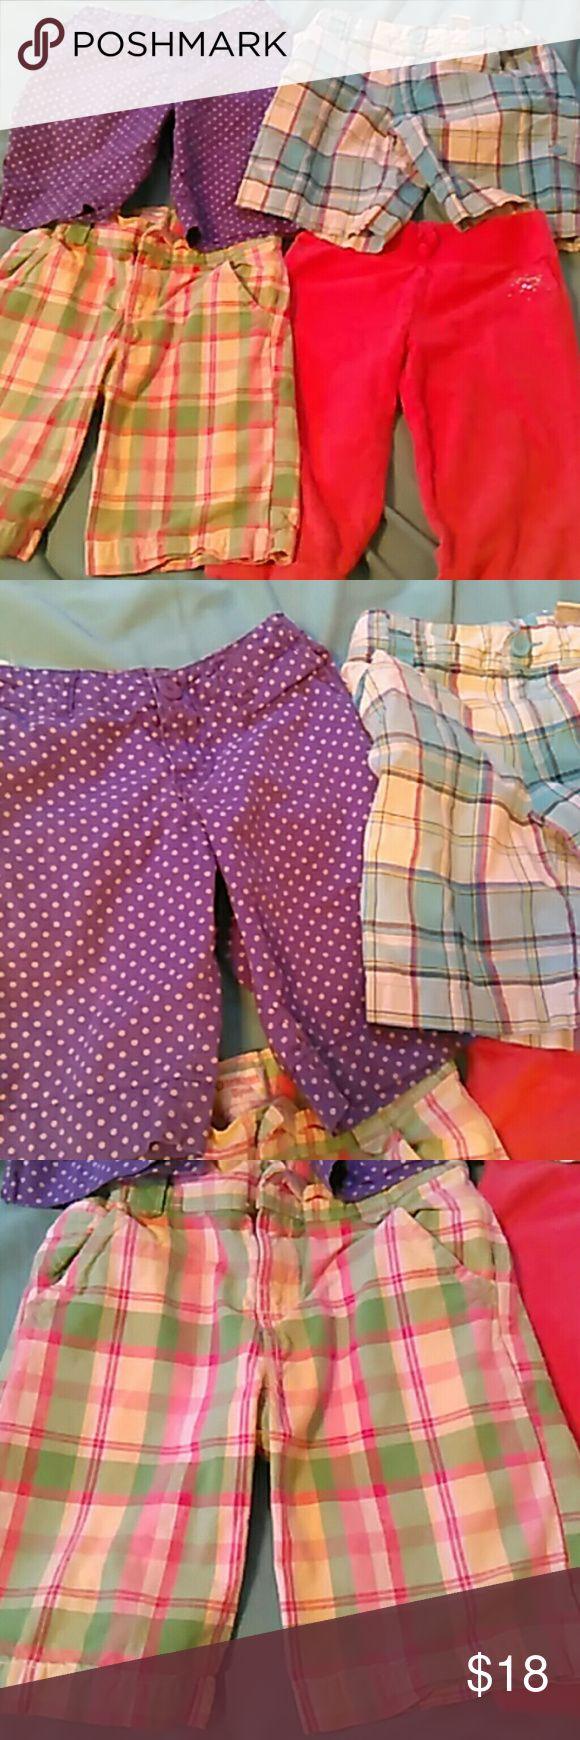 Lot of 4 Girls Shorts Size 7 Jumping Beans, Osh Kosh, Arizona, and Cherokee brand shorts in great condition! Osh Kosh Bottoms Casual